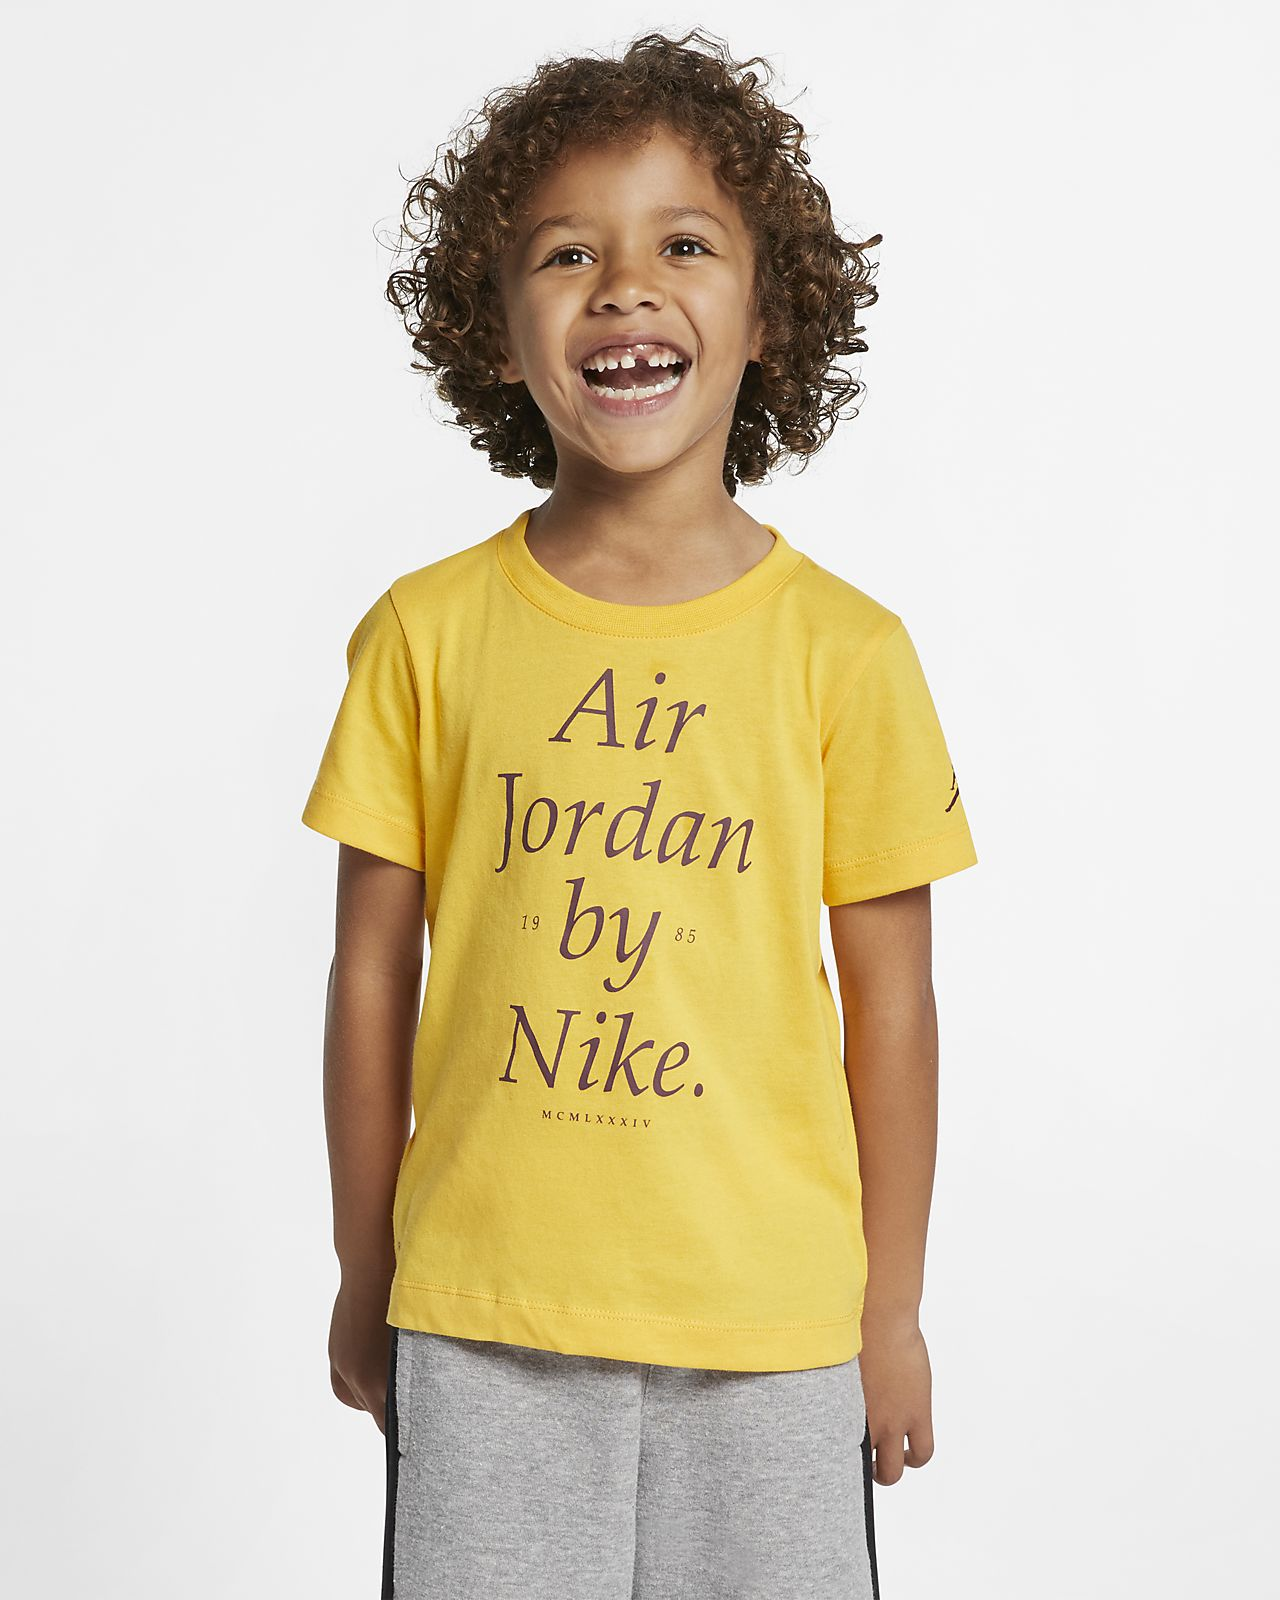 Tee-shirt Jordan Sportswear pour Jeune enfant